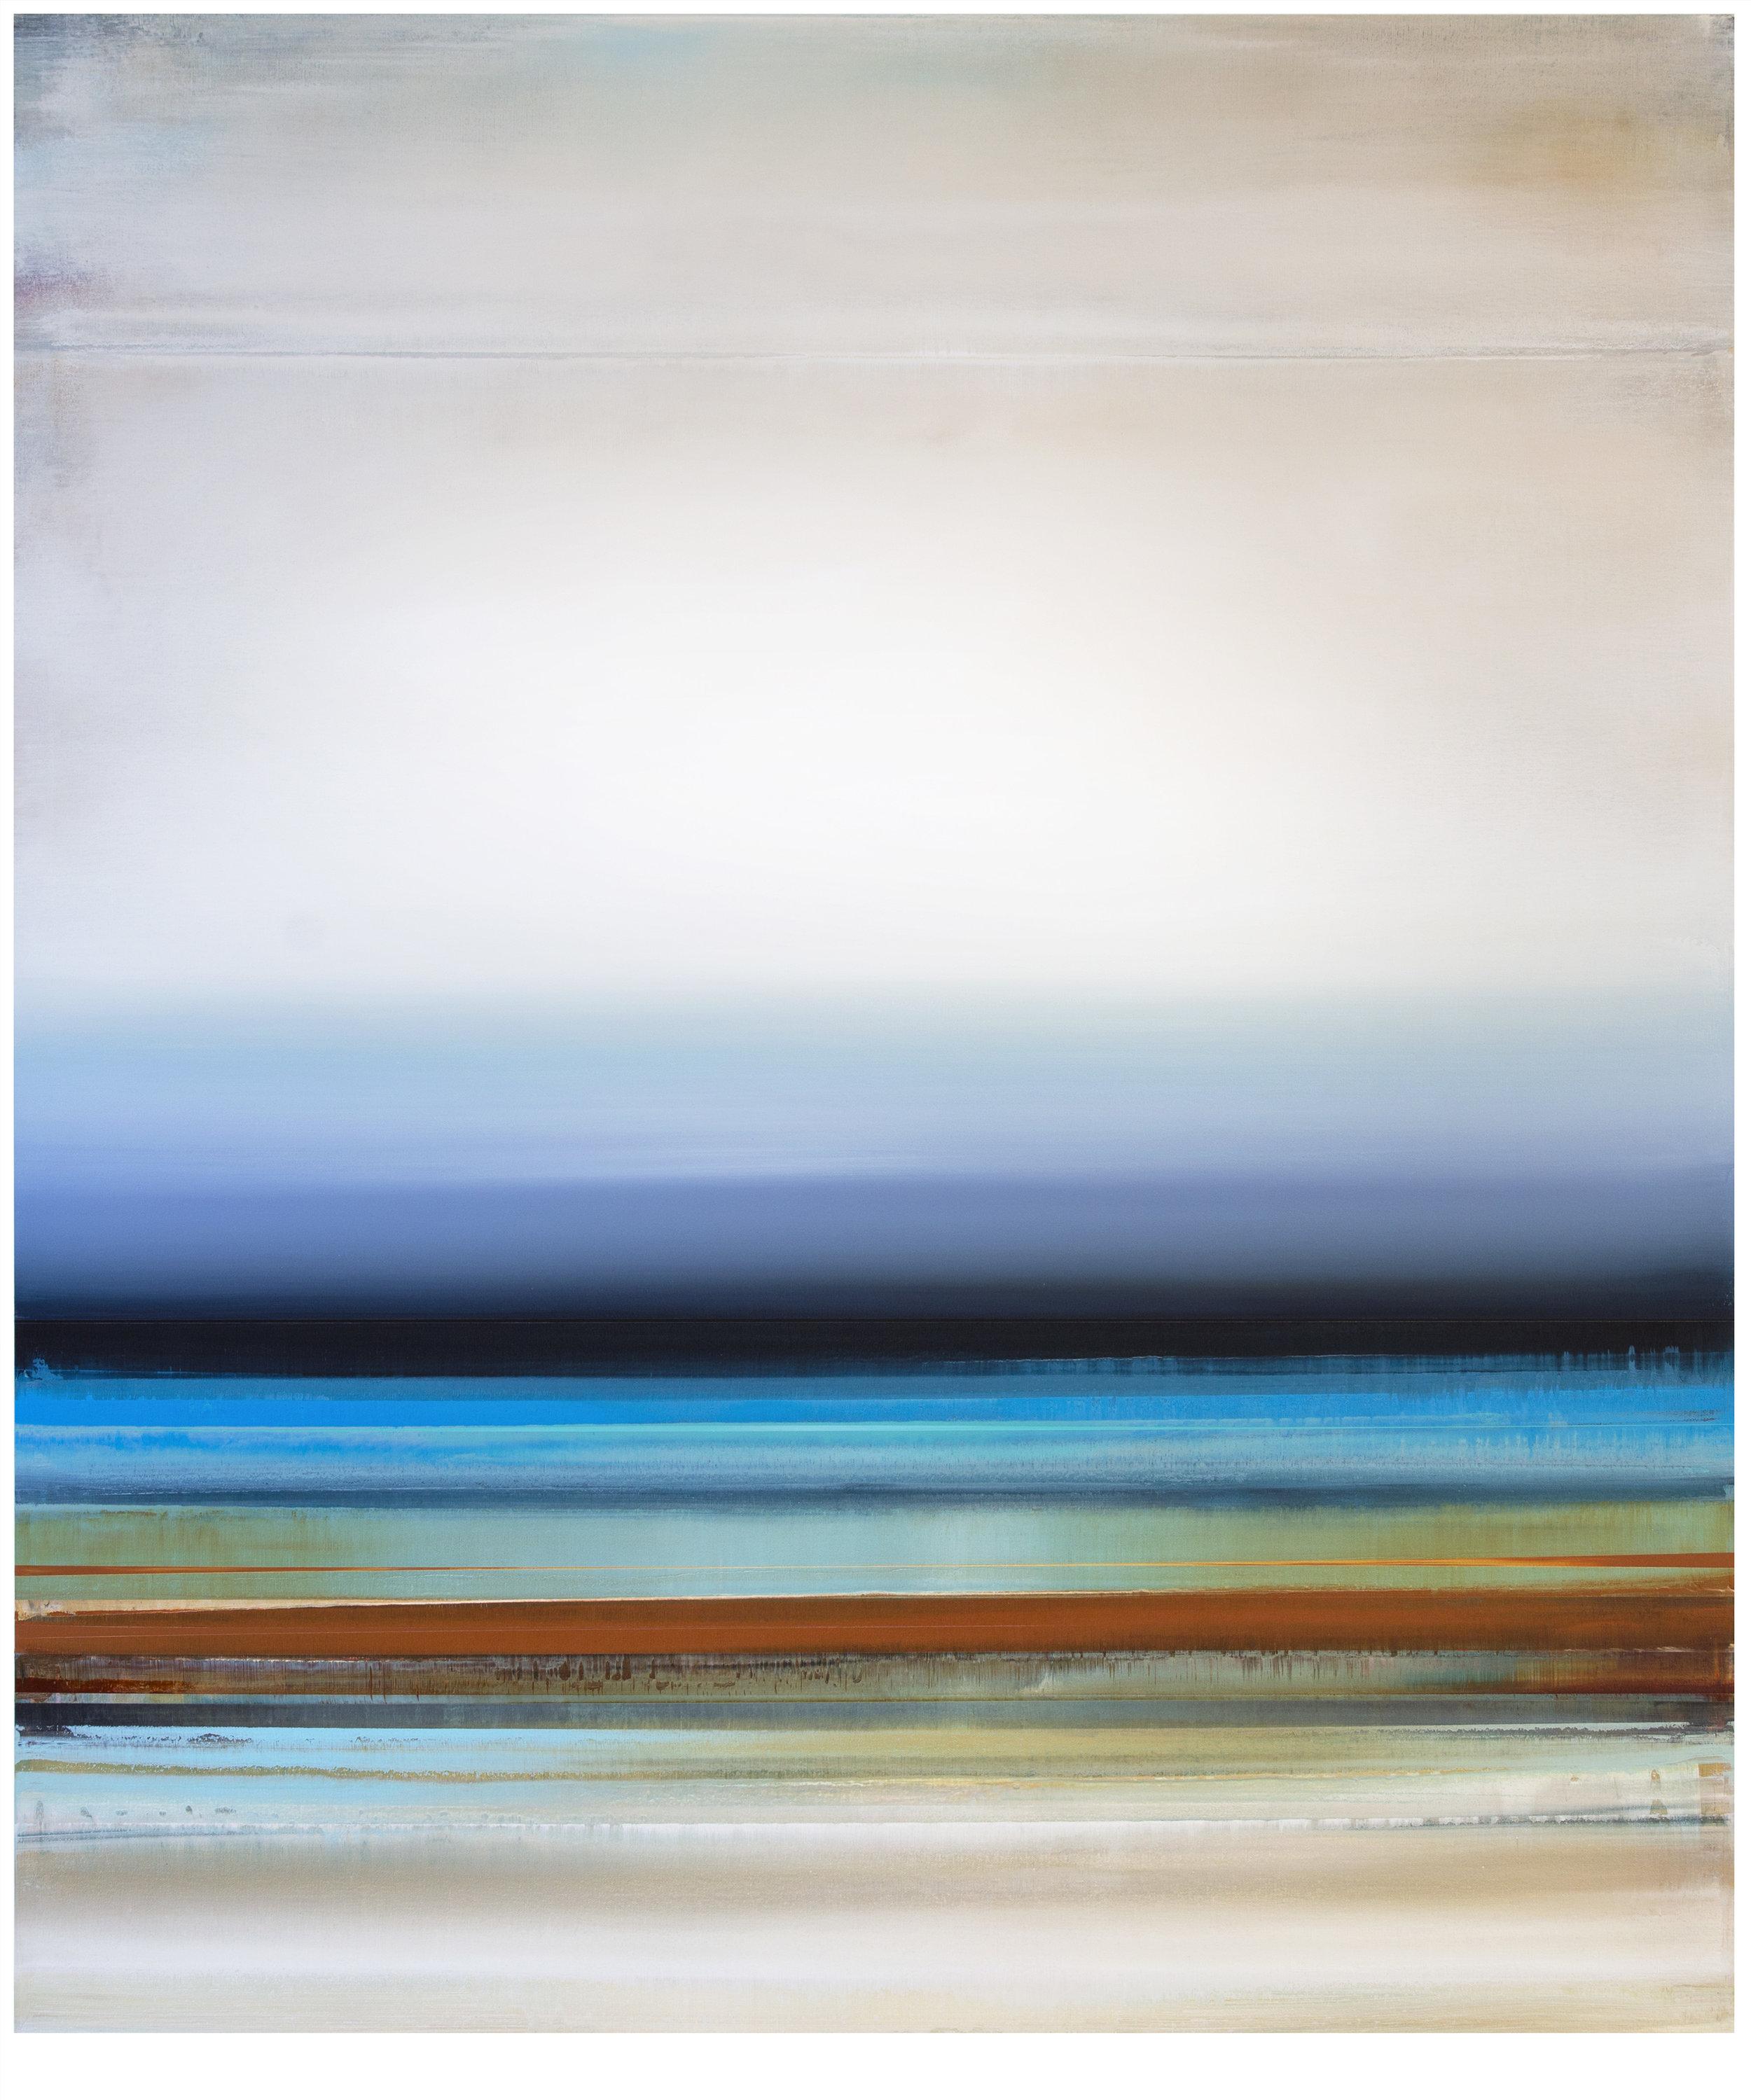 Micah Crandall-Bear, b.1980 (USA)  Title: Carnelian  Dimension: 152.56 x 121.92 cm  Year: 2017